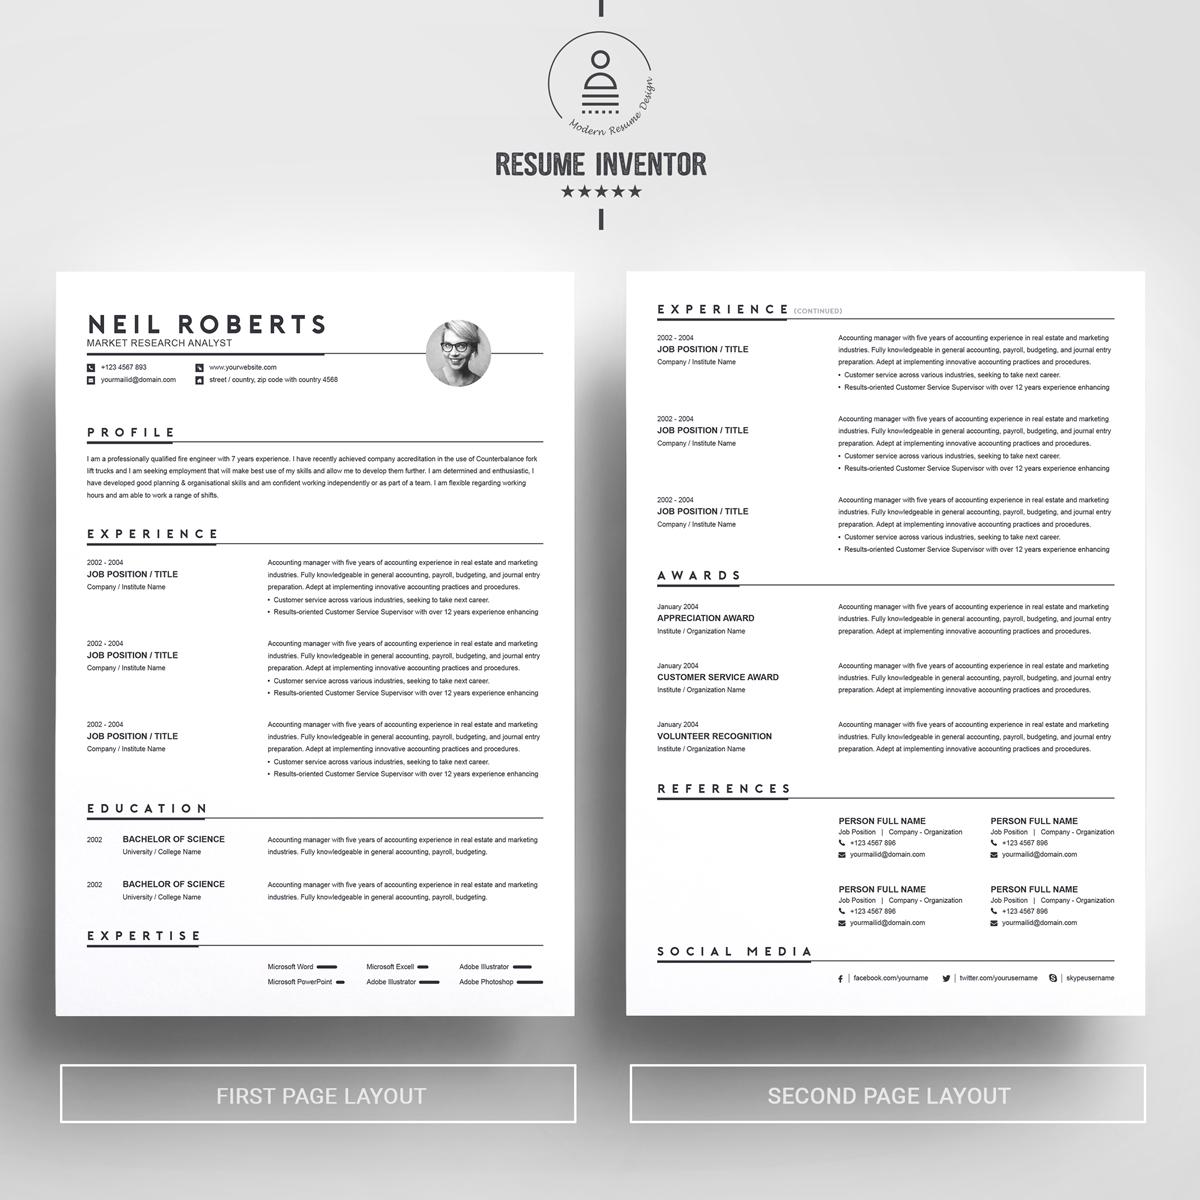 https://s3u.tmimgcdn.com/1860567-1546500798288_02_2-Pages-Free-Resume-Design-Template.jpg